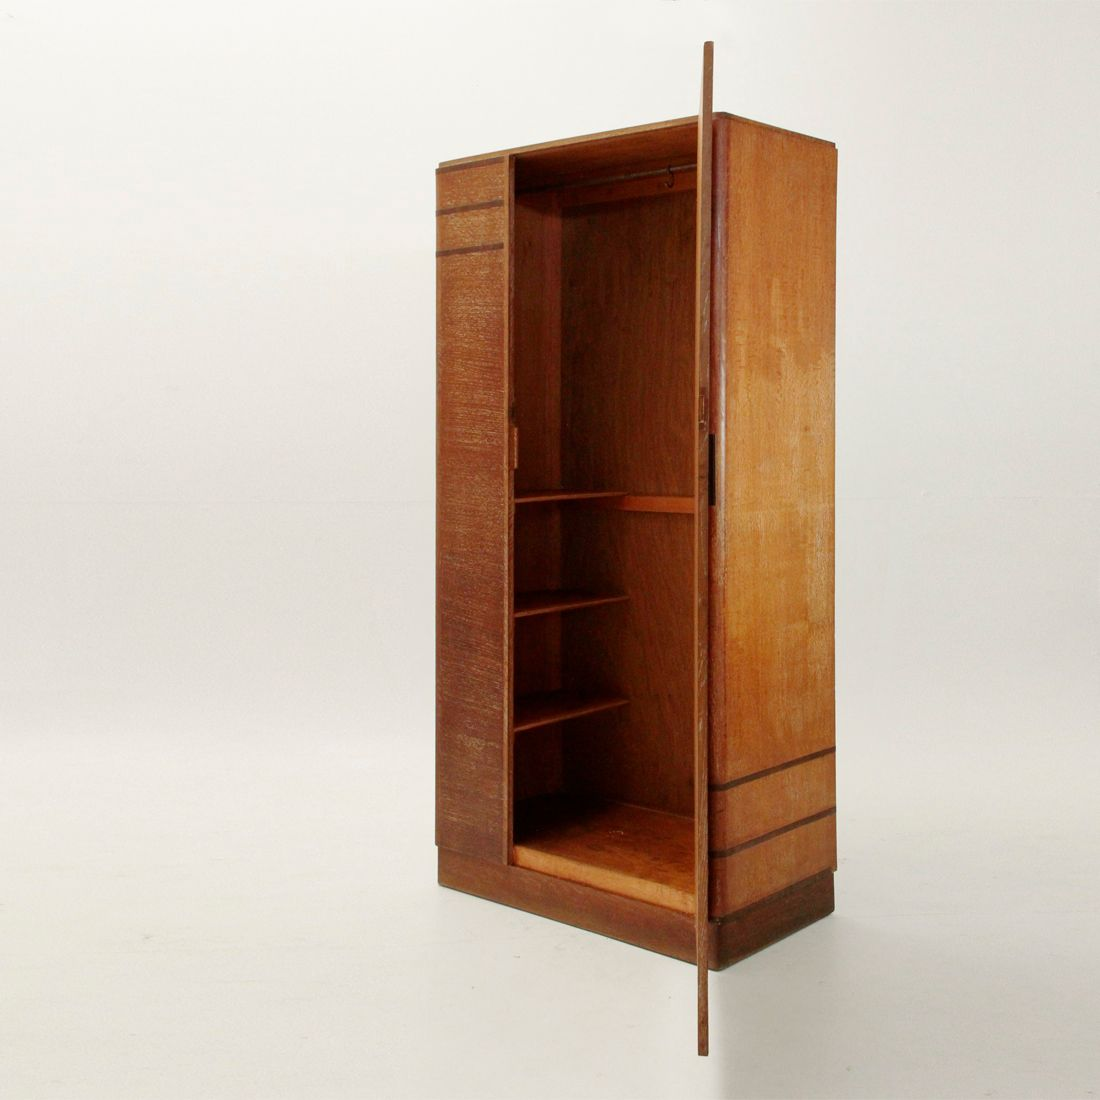 italienischer rationalistischer vintage schrank 1940er. Black Bedroom Furniture Sets. Home Design Ideas